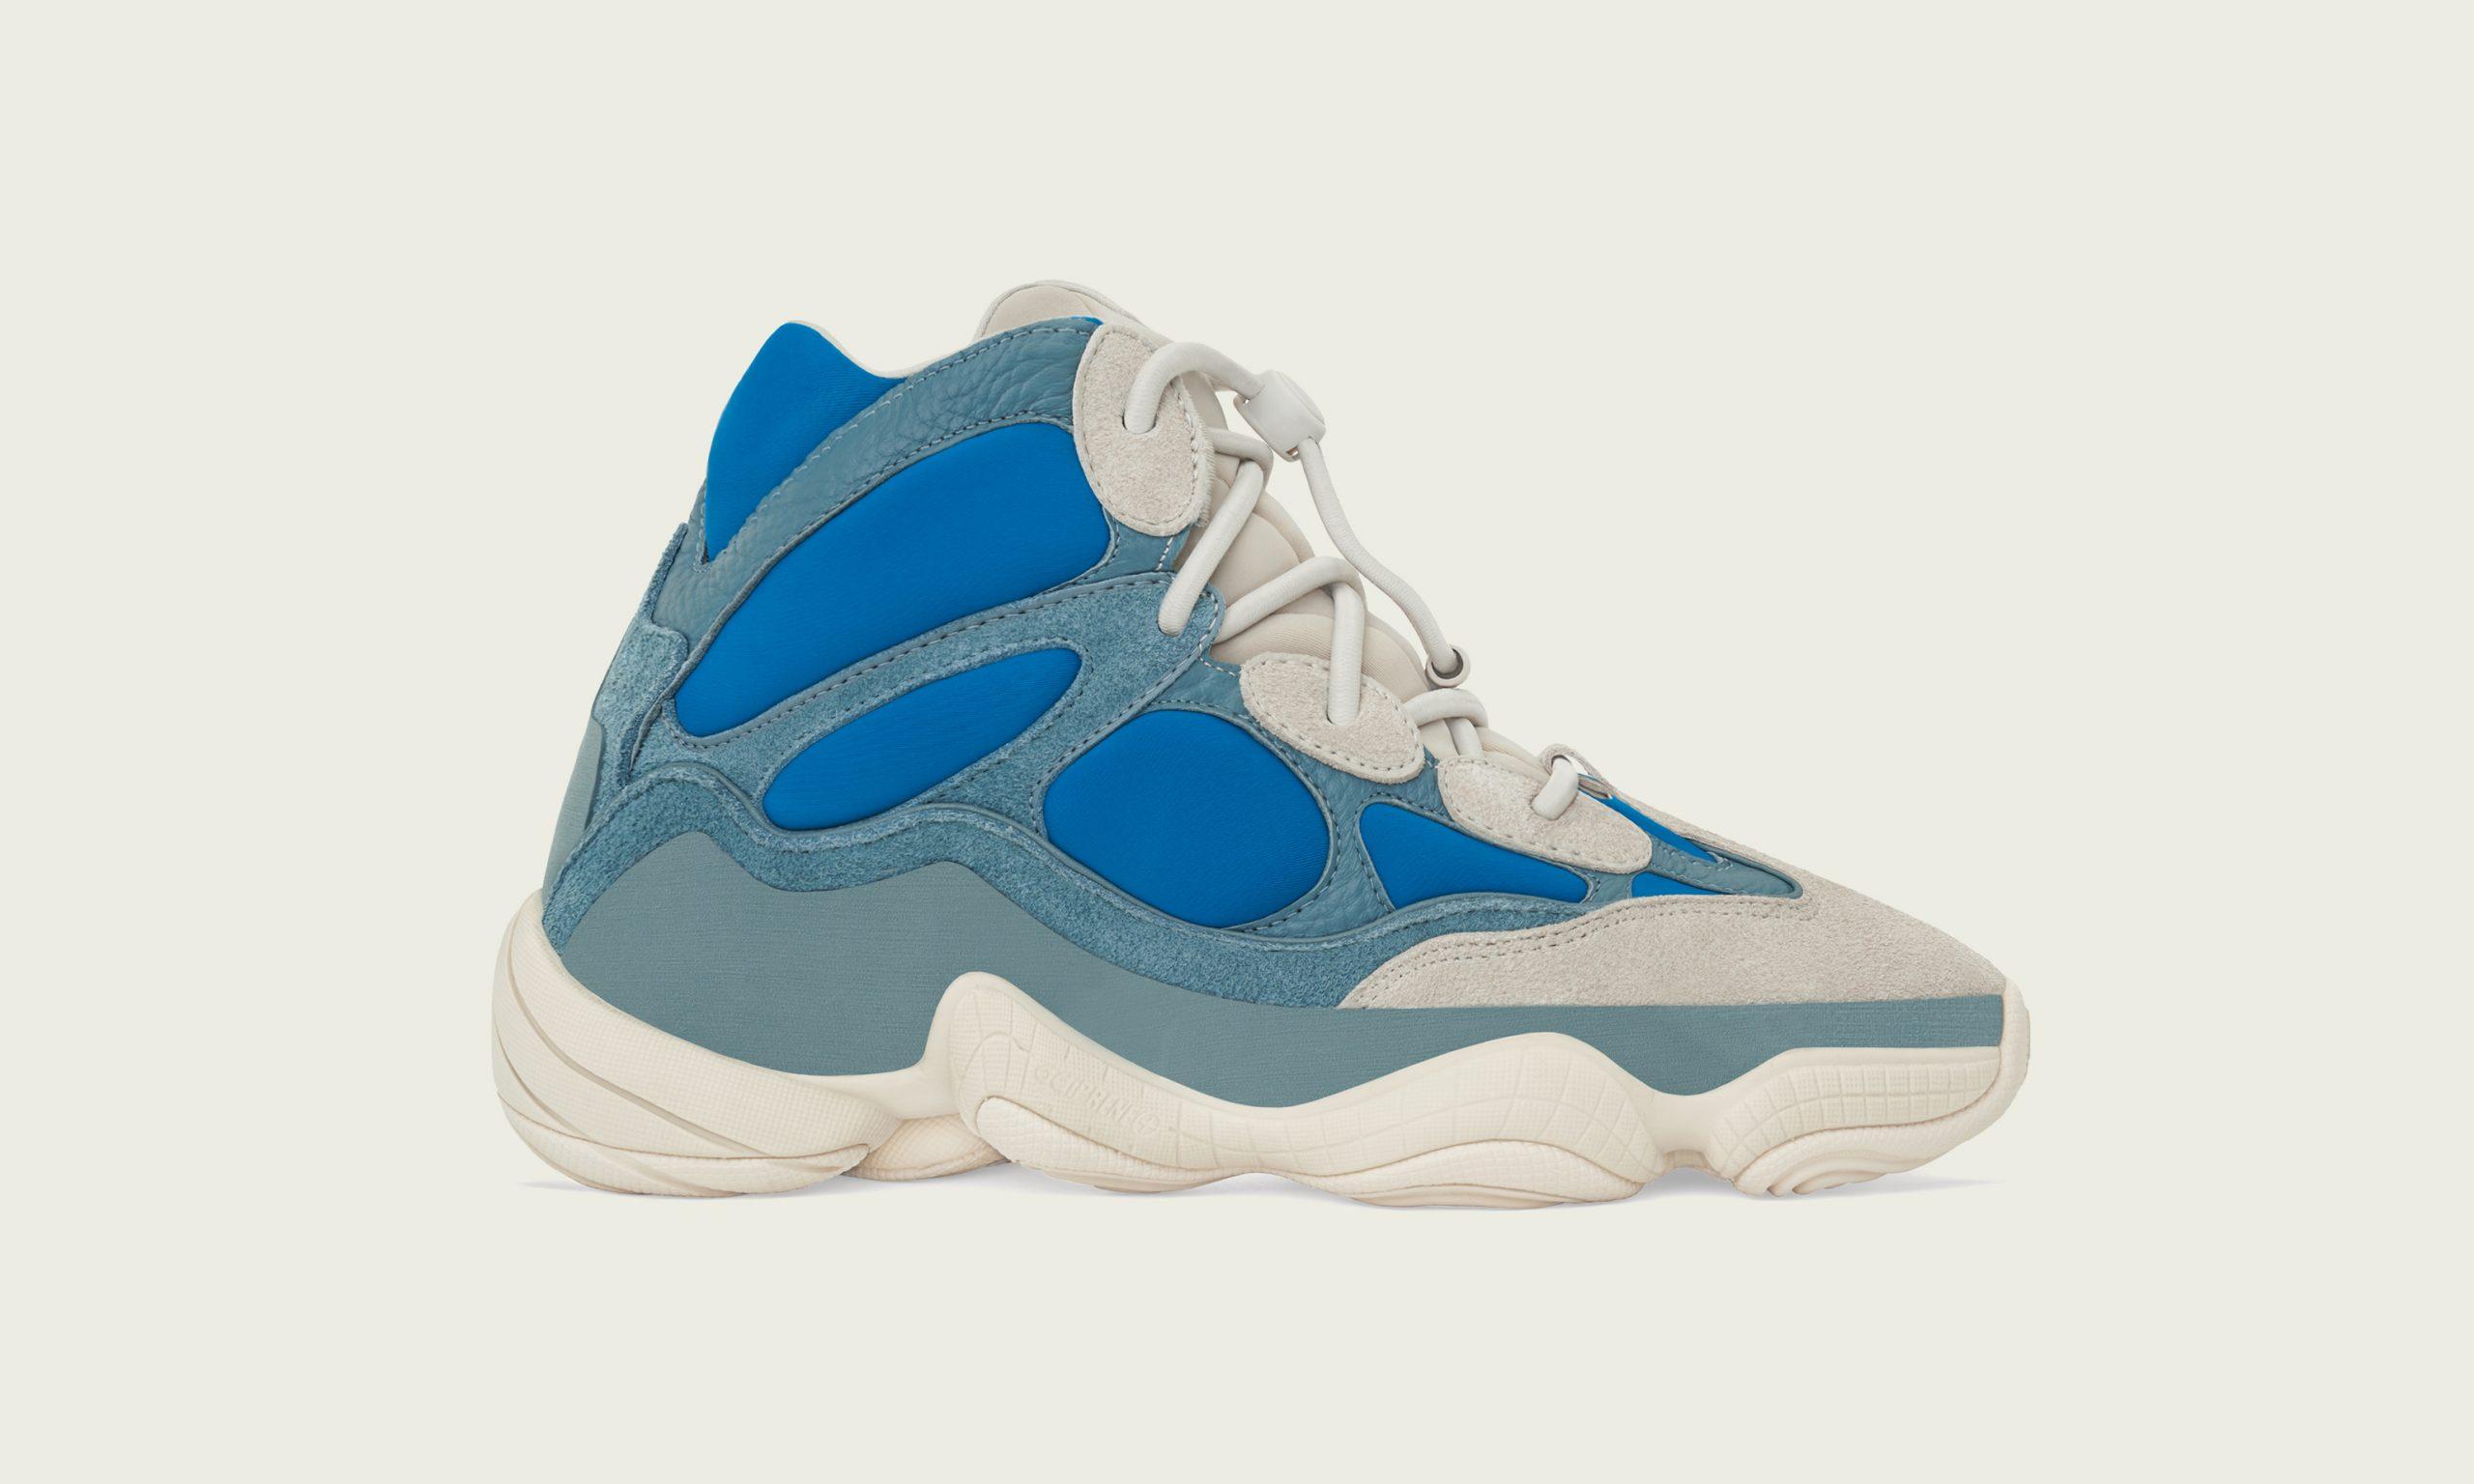 霜蓝降世,adidas Originals 推出 YEEZY 500 HIGH Frost Blue 鞋款